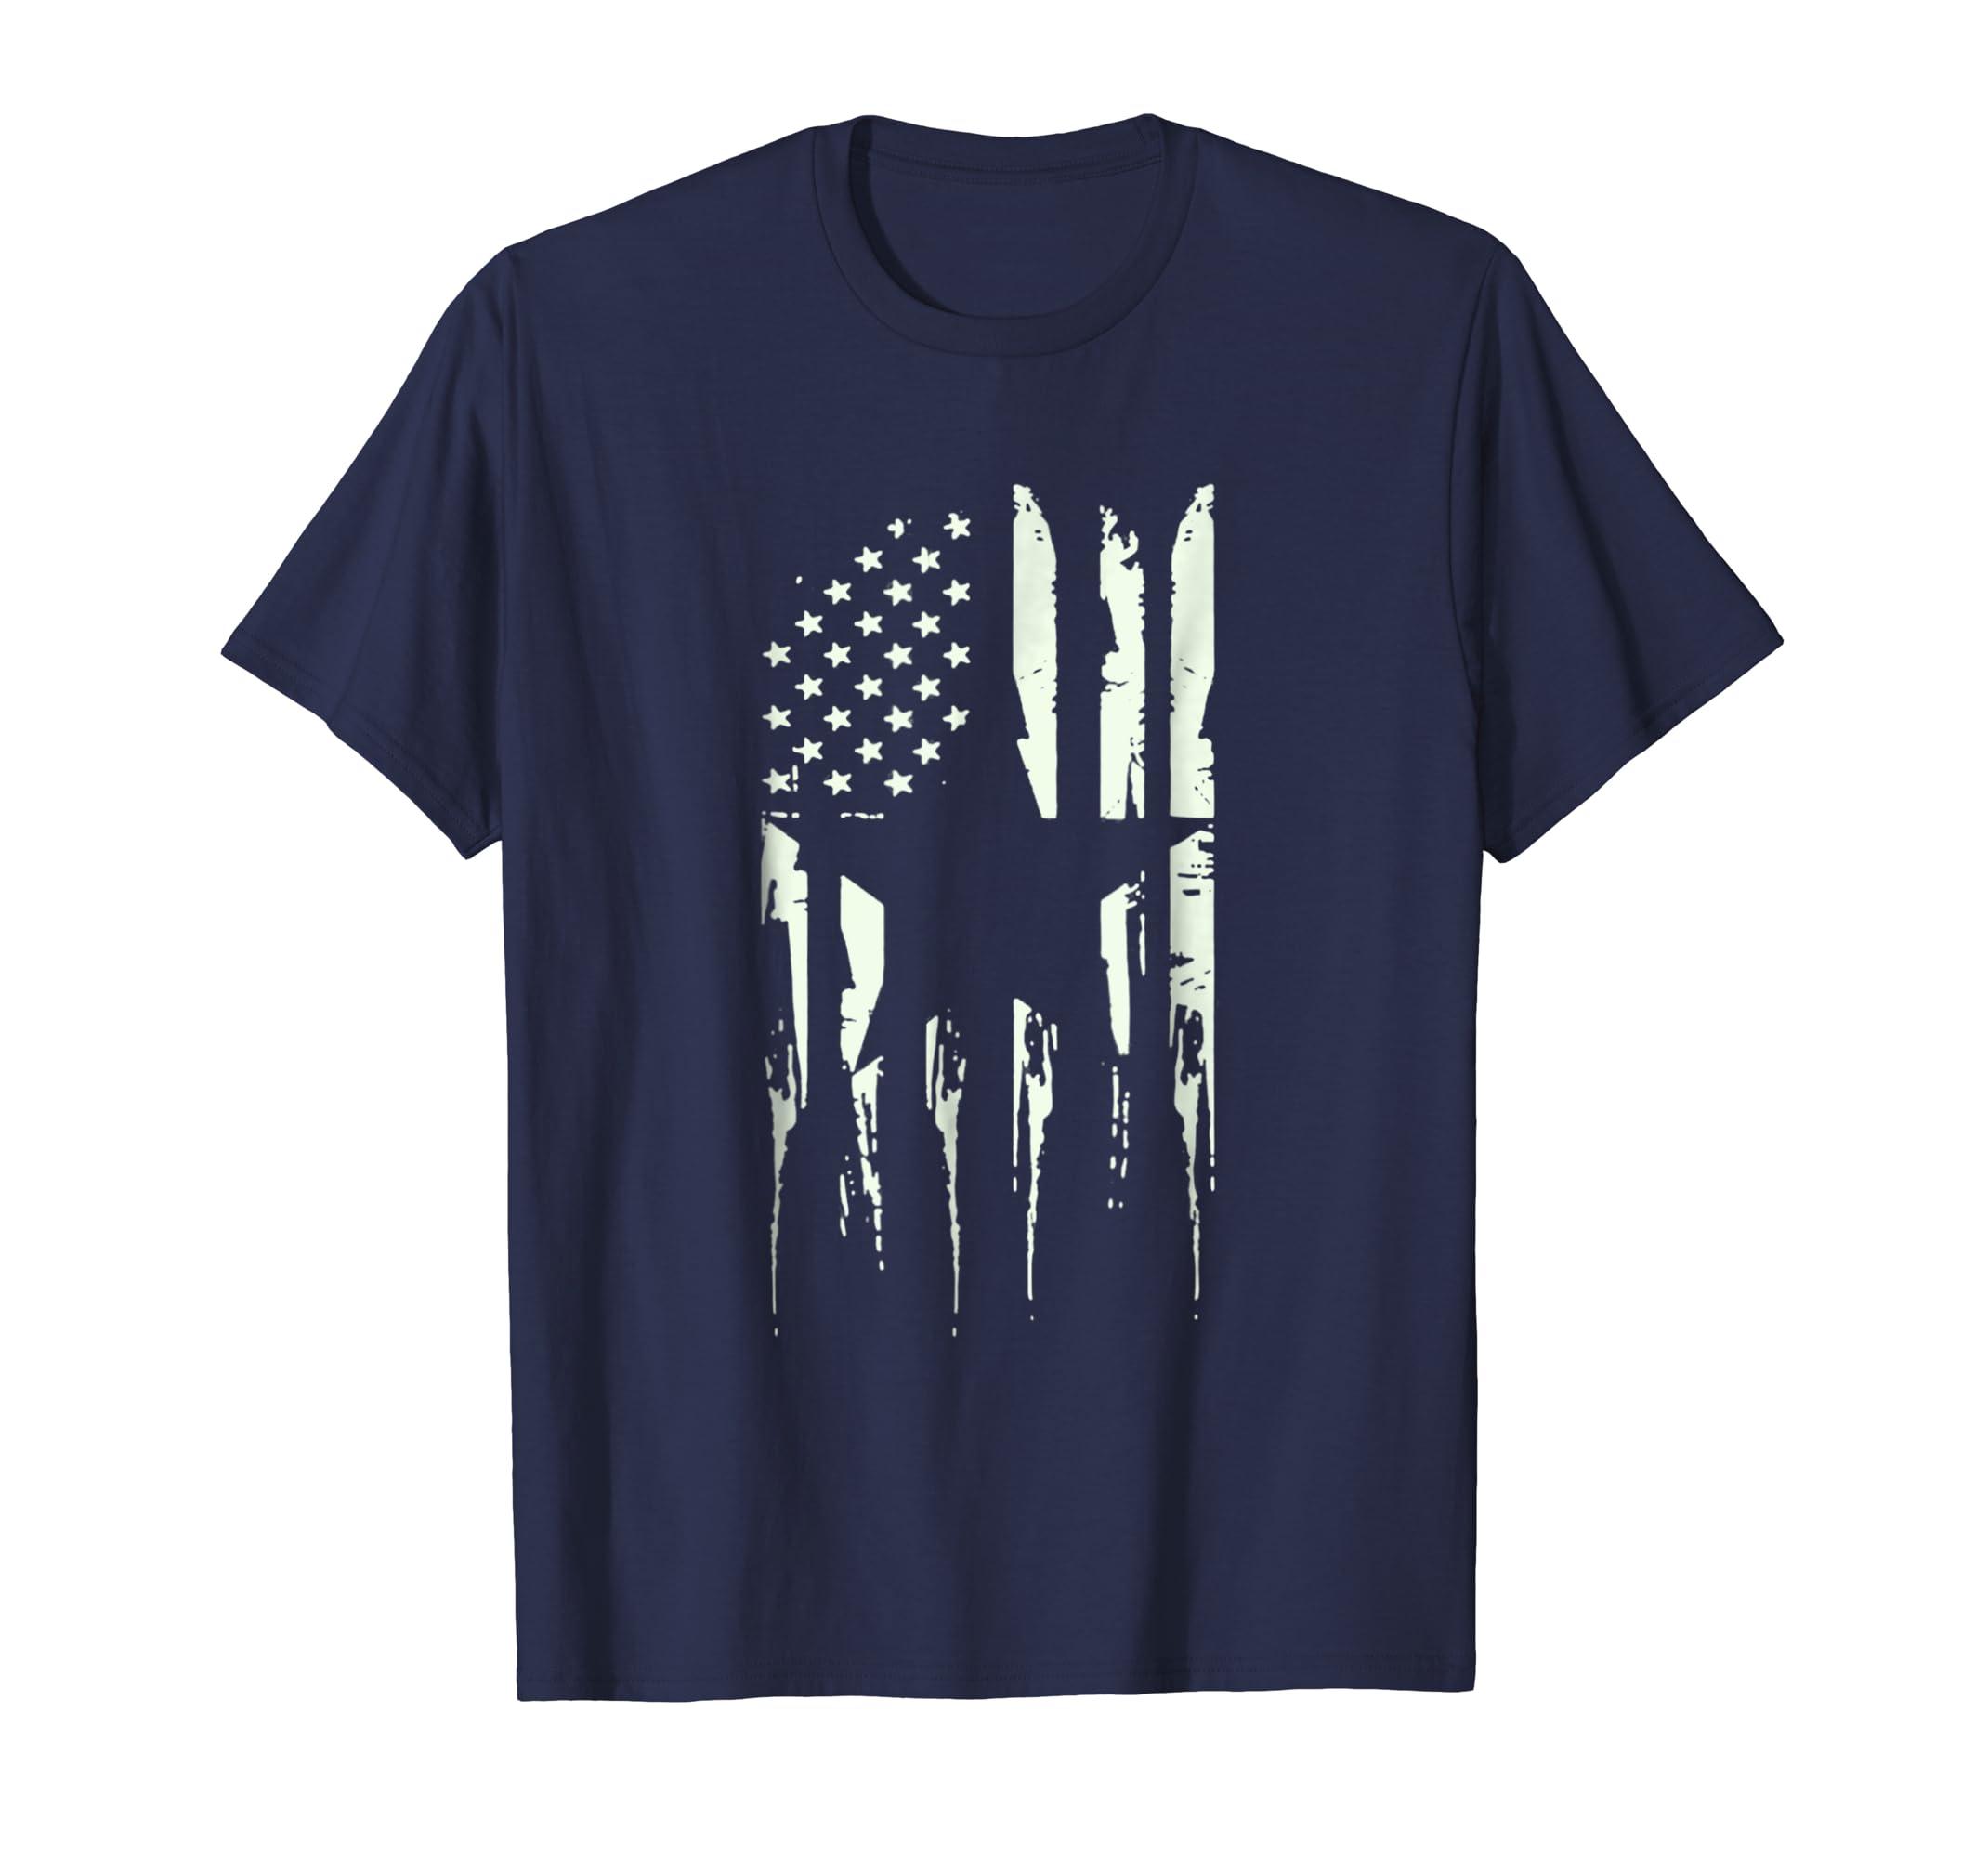 +_Dallas Football T Shirt.fans Flag_Christmas Gifts Tees_+-azvn